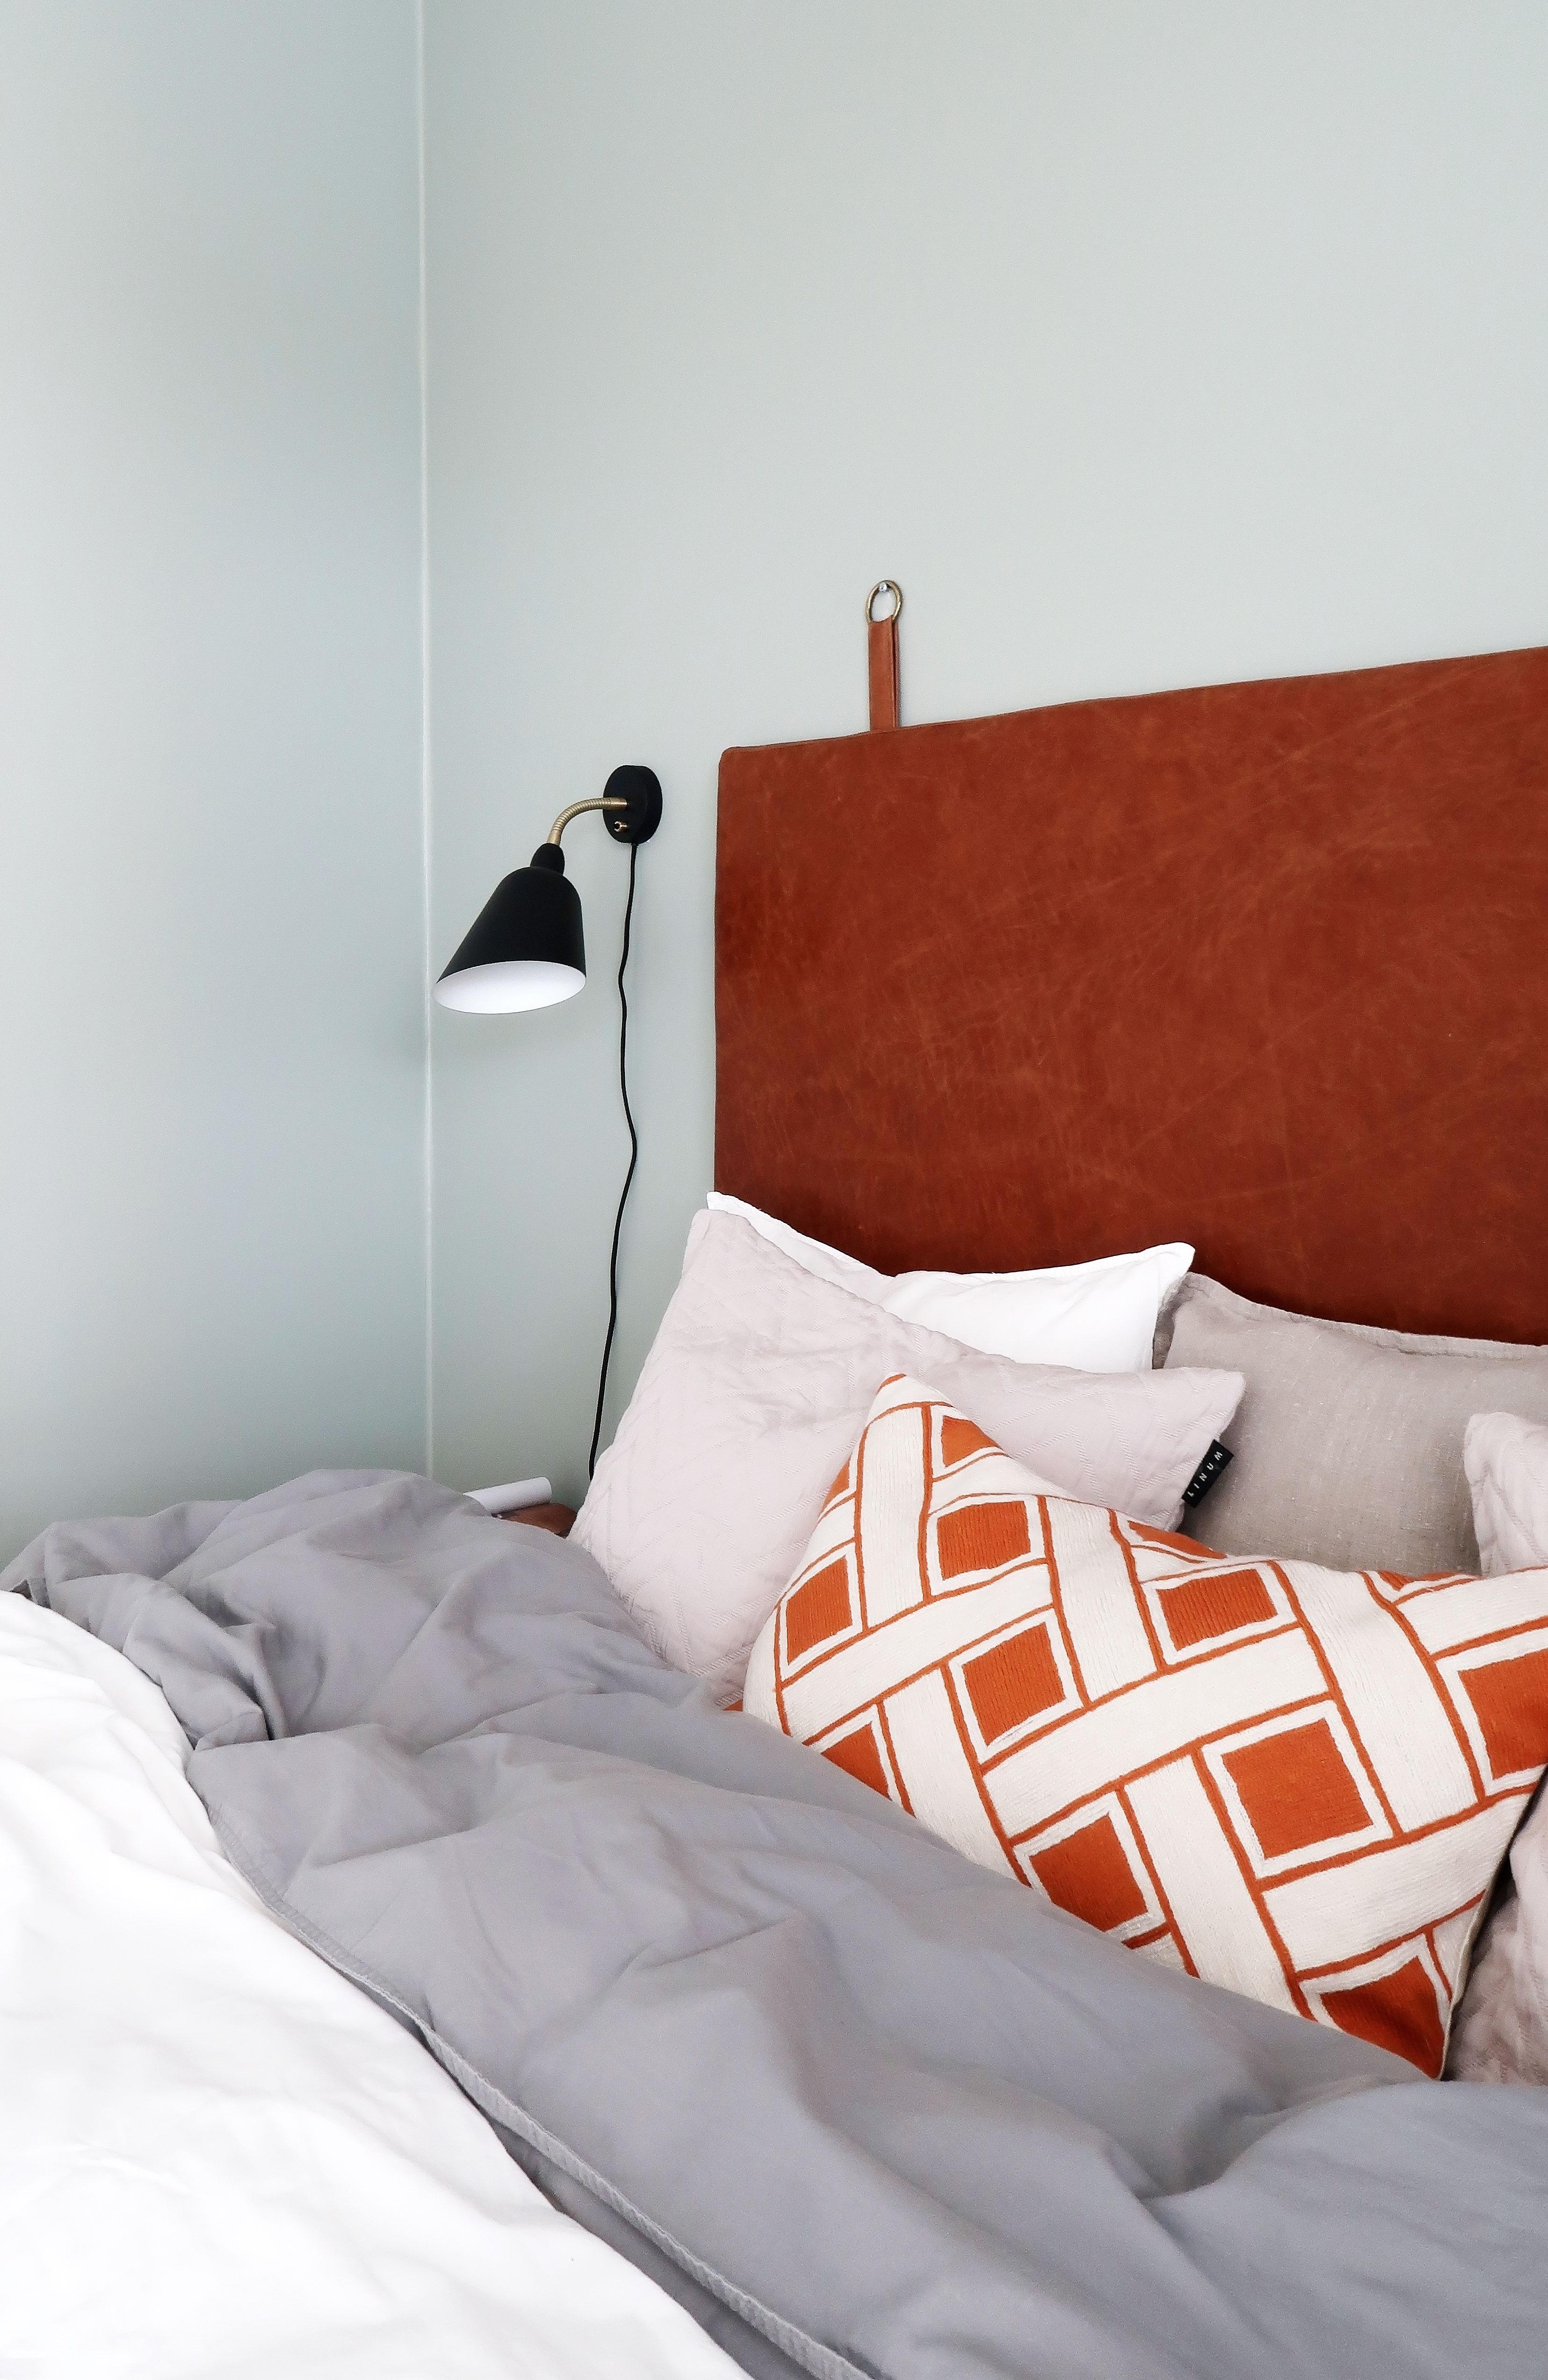 JM-slussen-sovrum-bedroom-interior-4